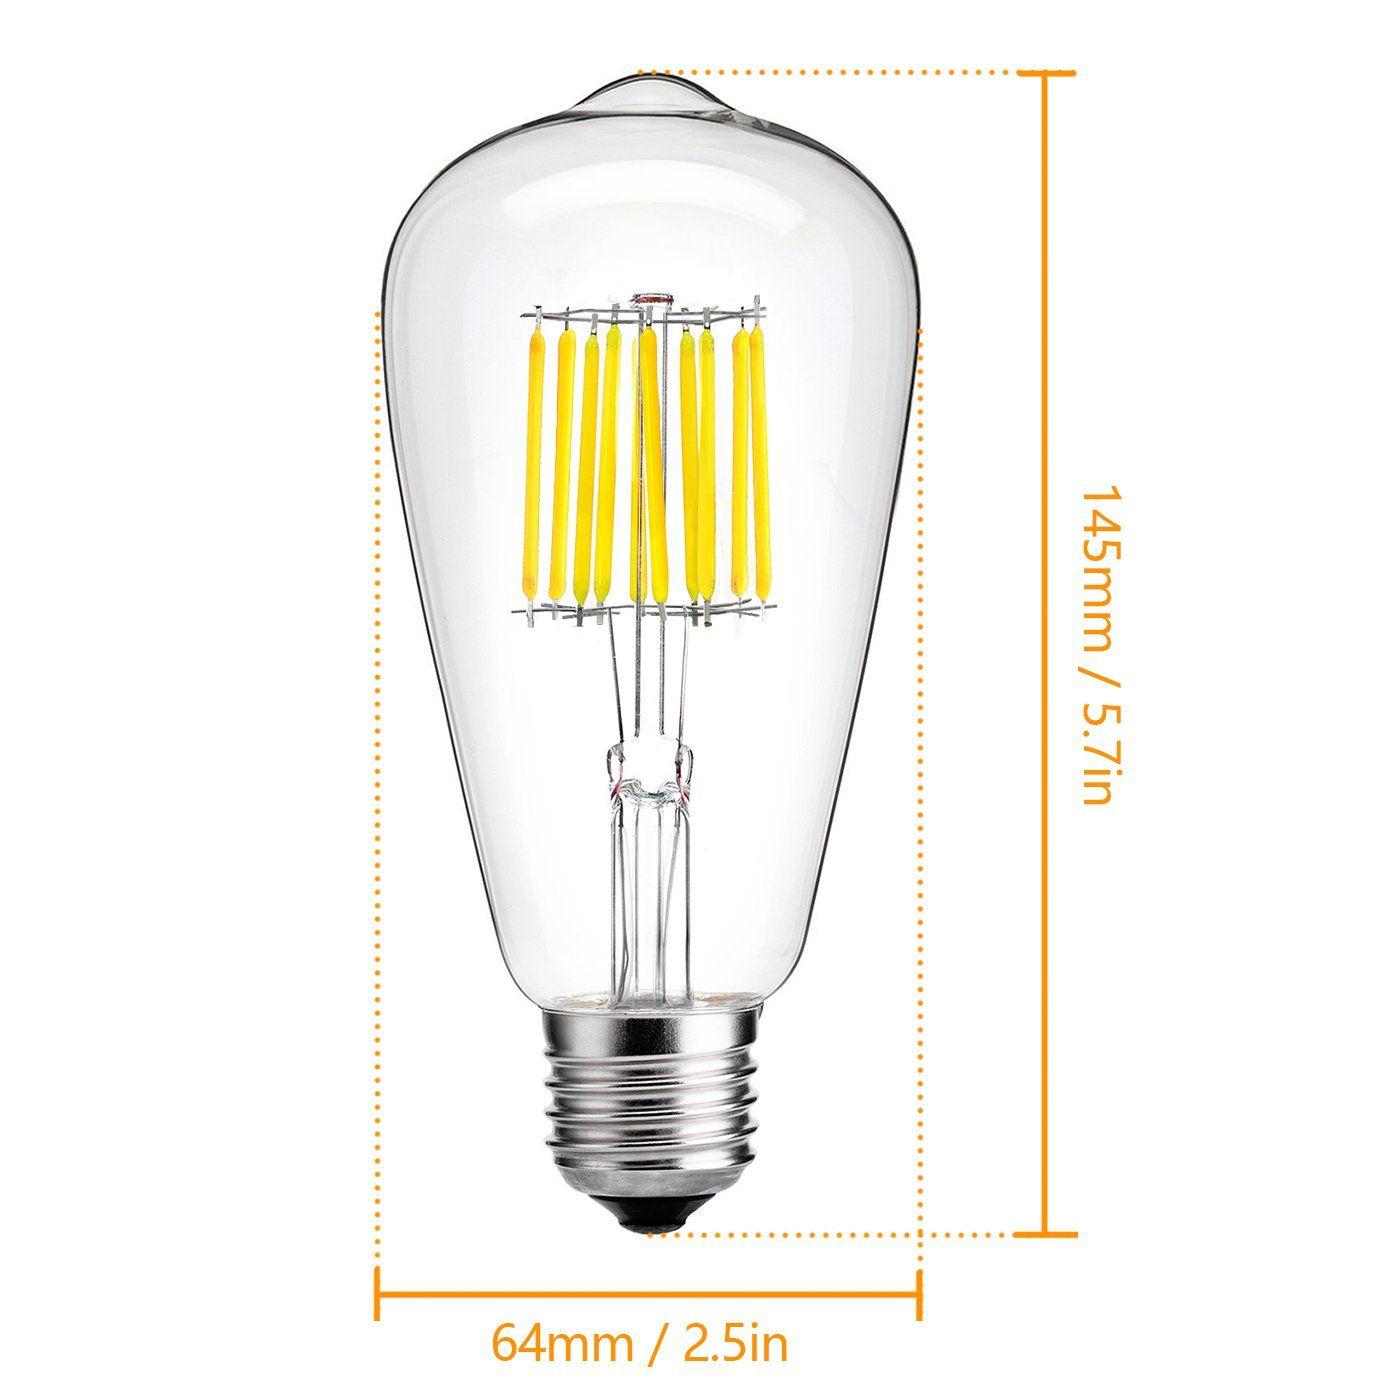 Hzsane 10w Edison Style Vintage Led Filament Light Bulb 6000k Daylight White 1000lm St64st21 Antique Shapee26 Medium Base Lamp 100w Incandesc Bulb Light Bulb Led